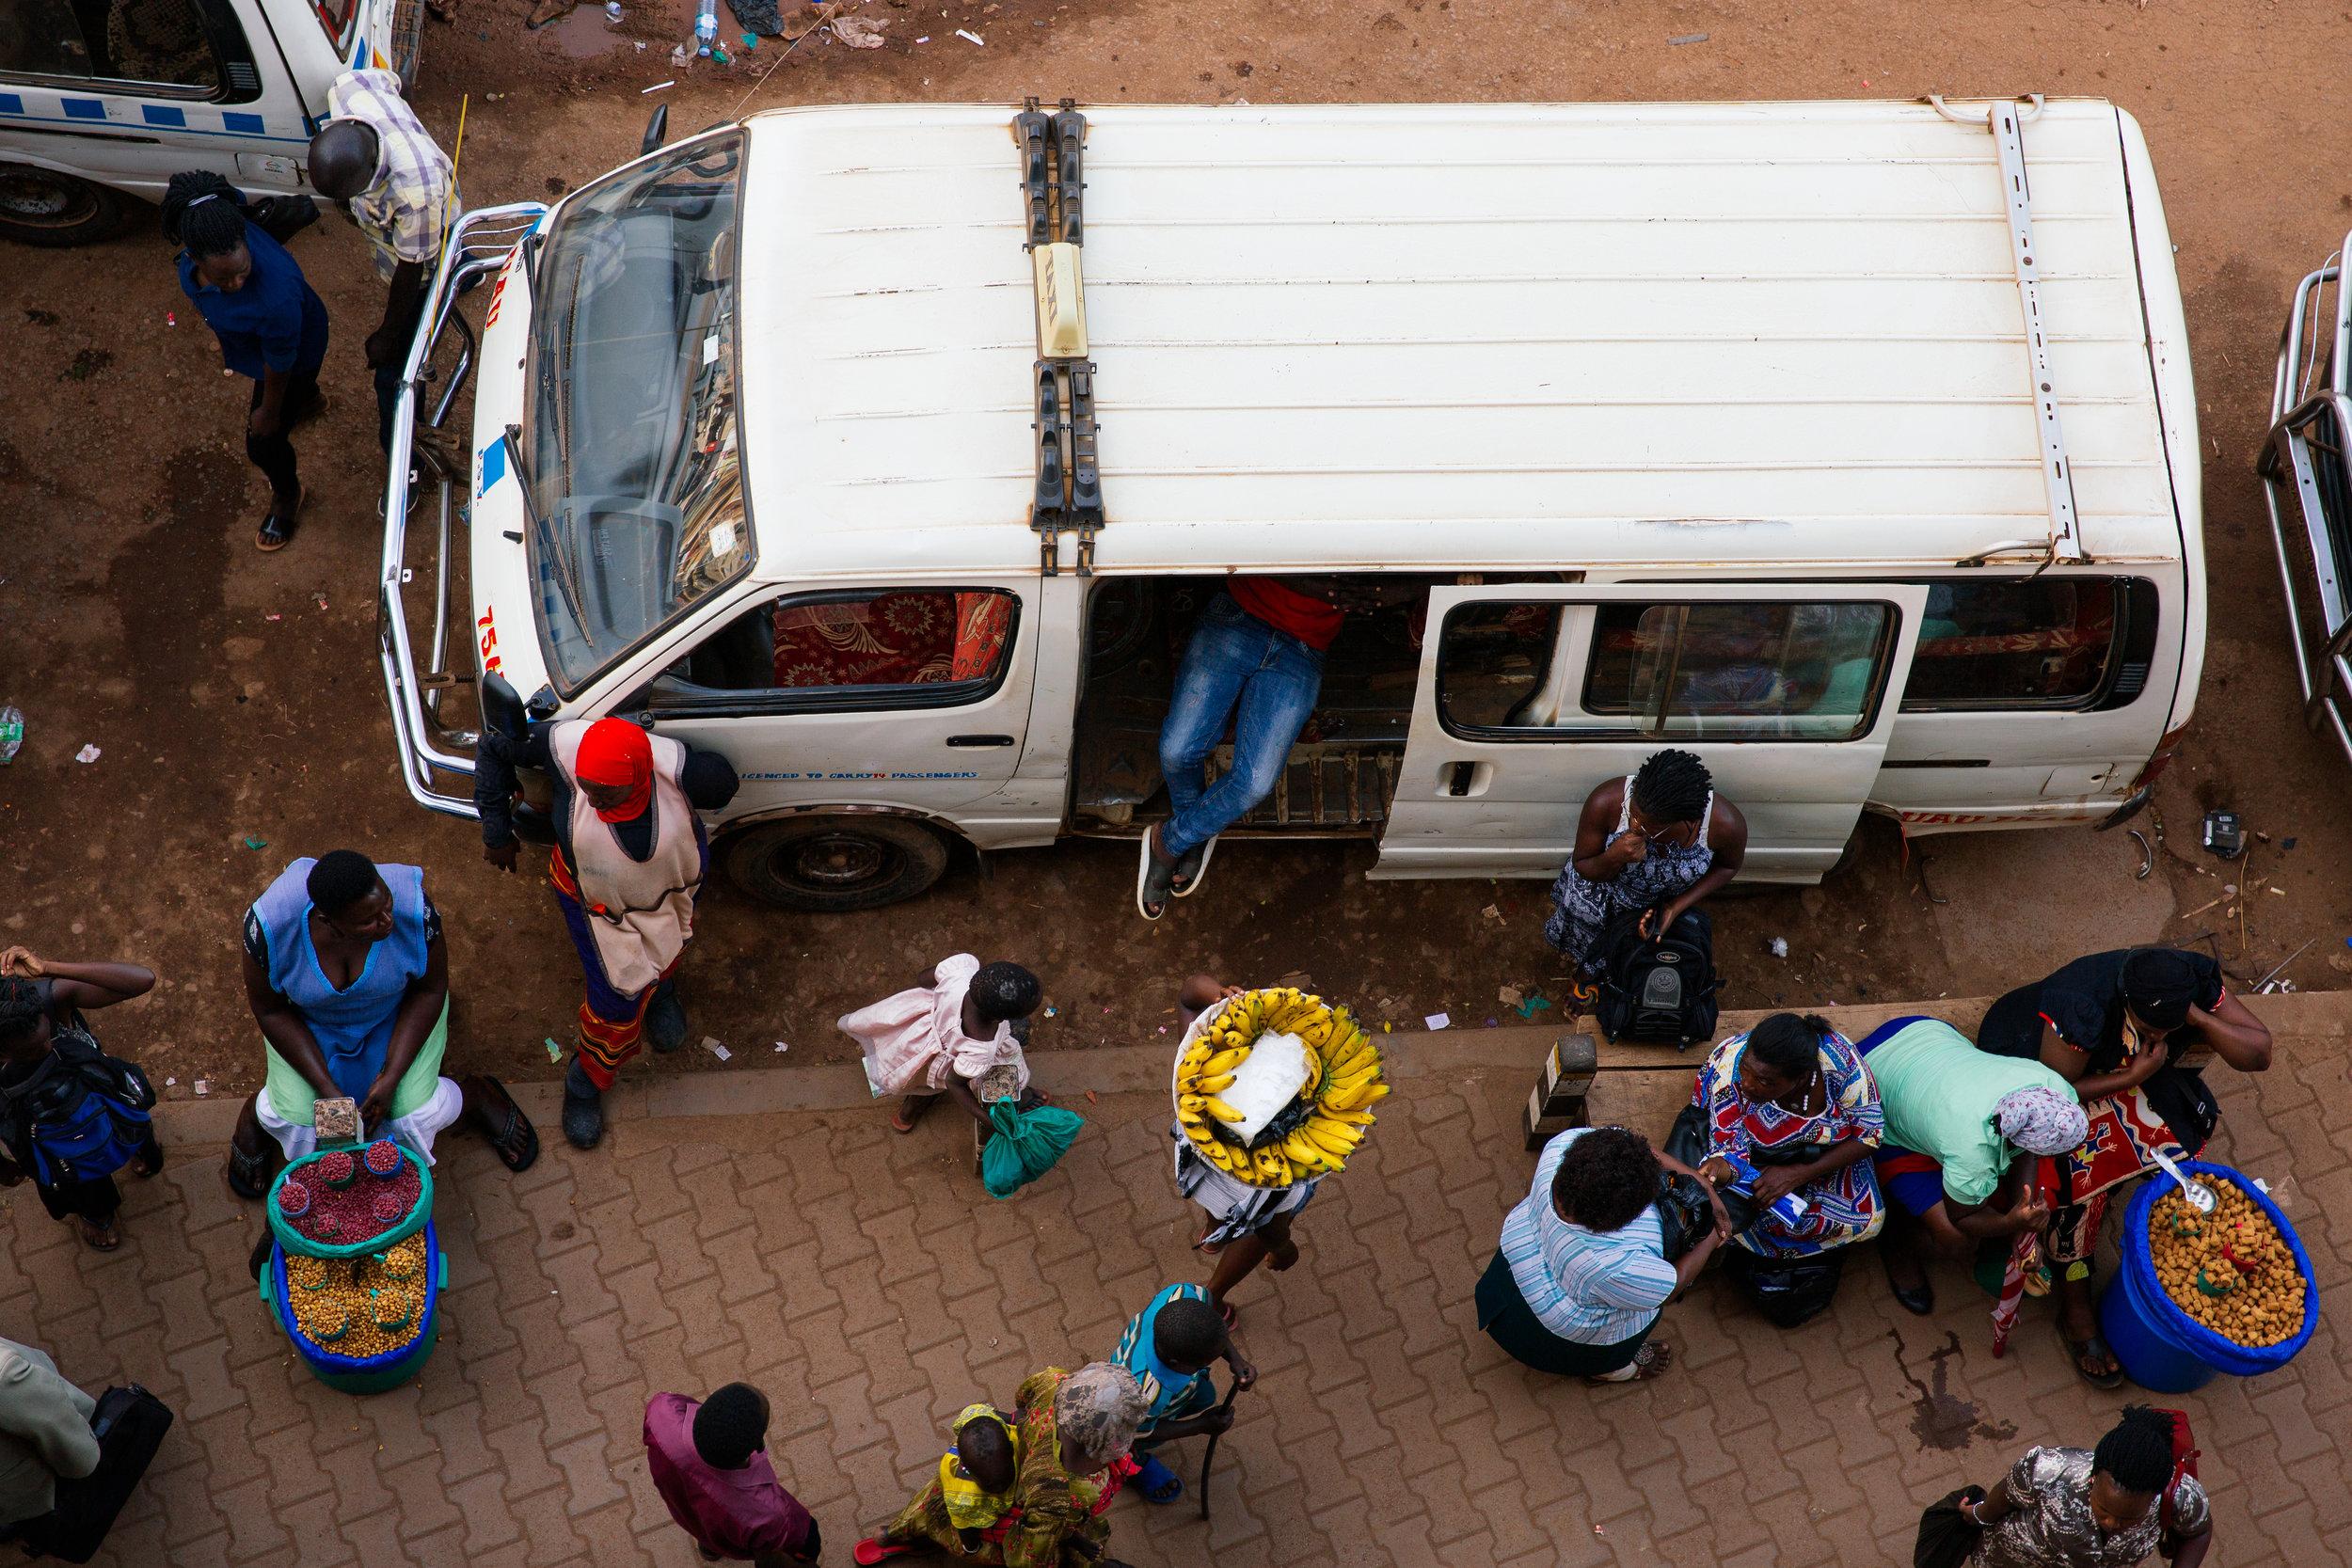 UgandaDay5StreetPhotos-32.jpg